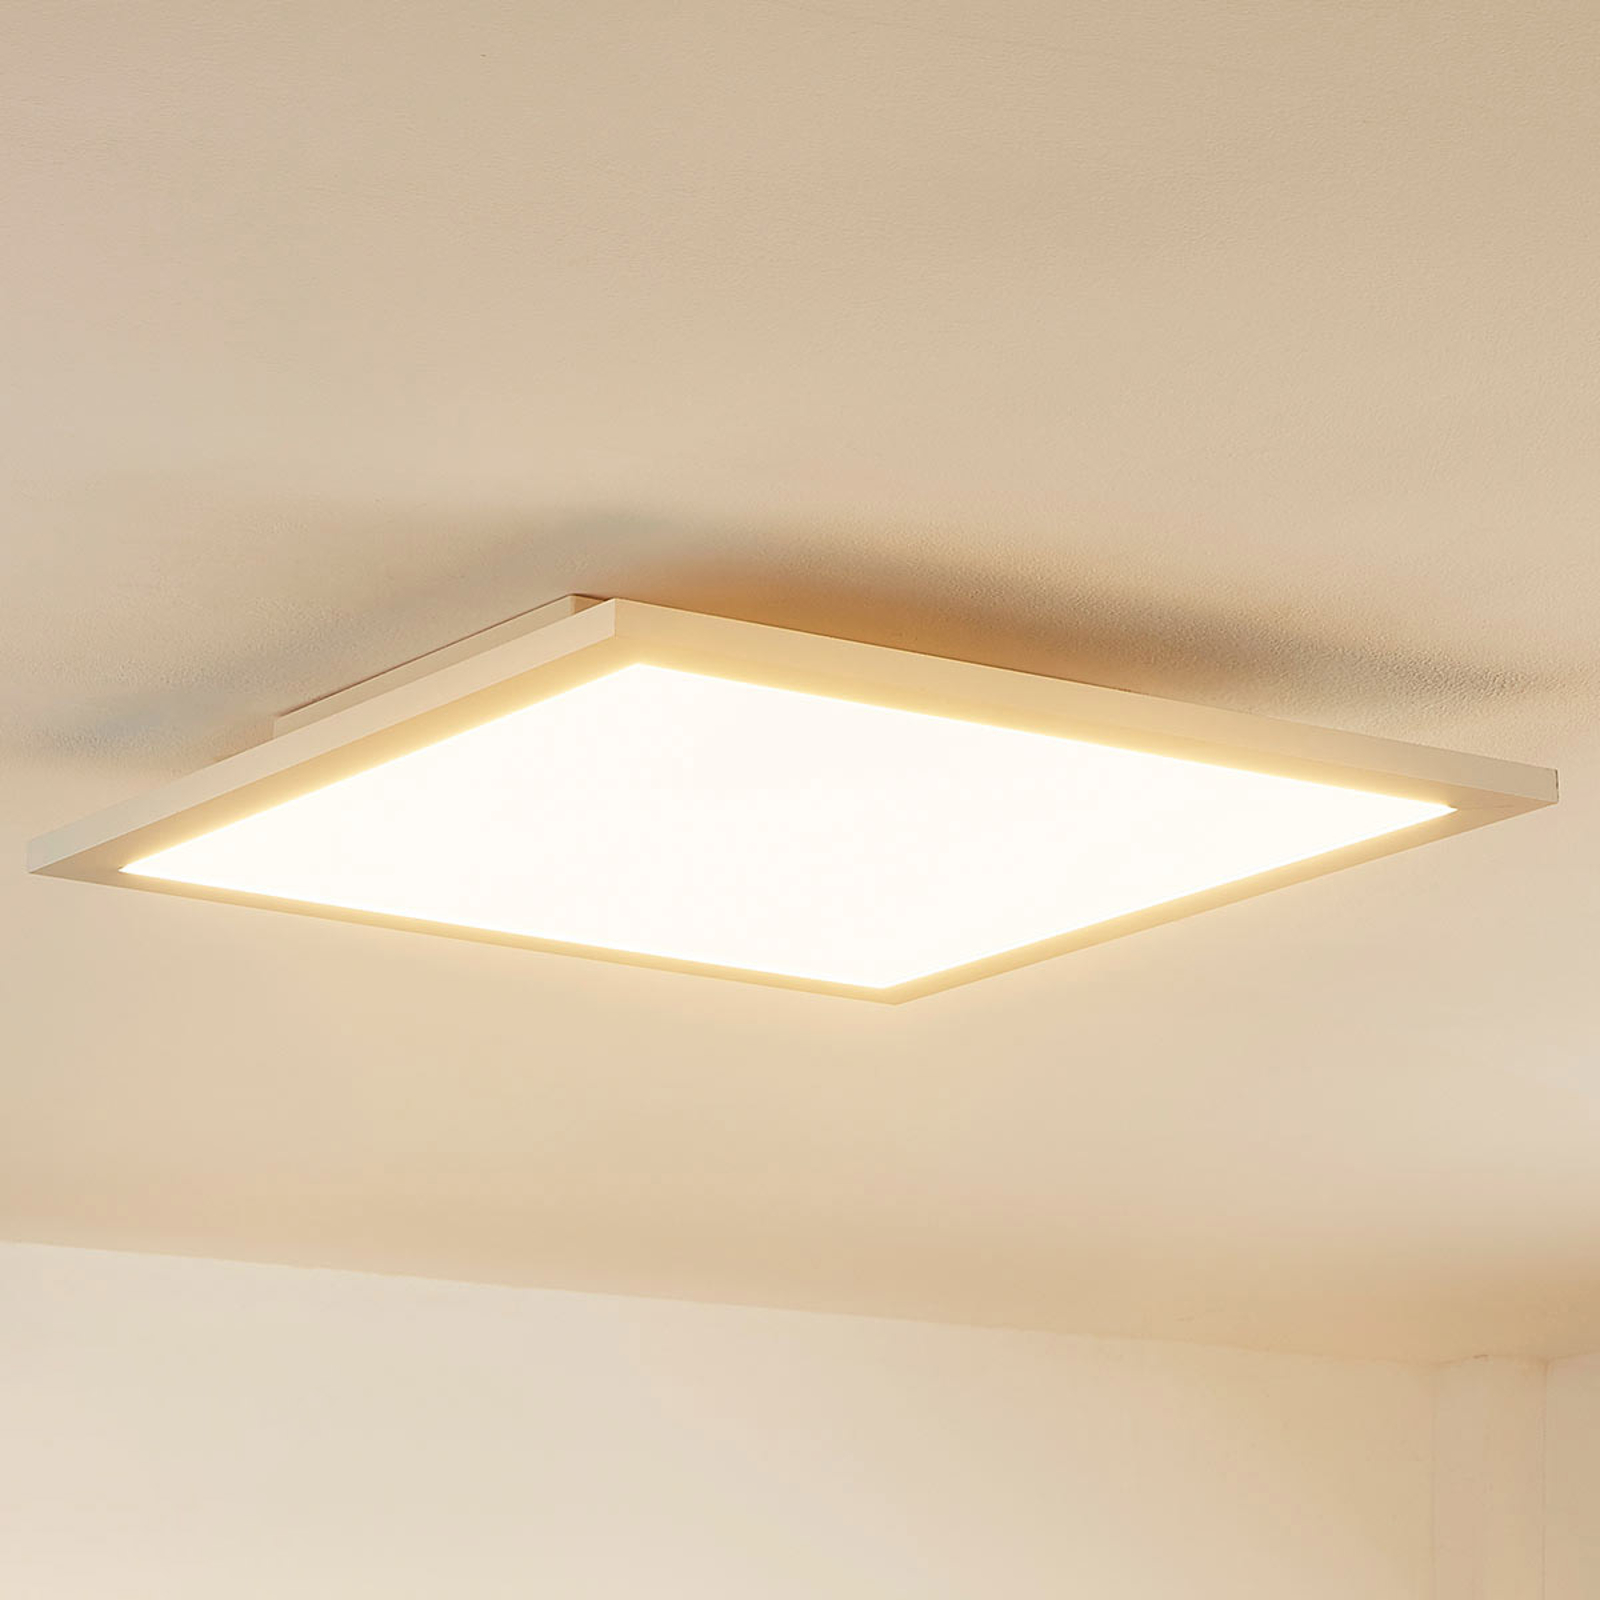 Kvadratisk LED-takpanel Enja, utenpåliggende